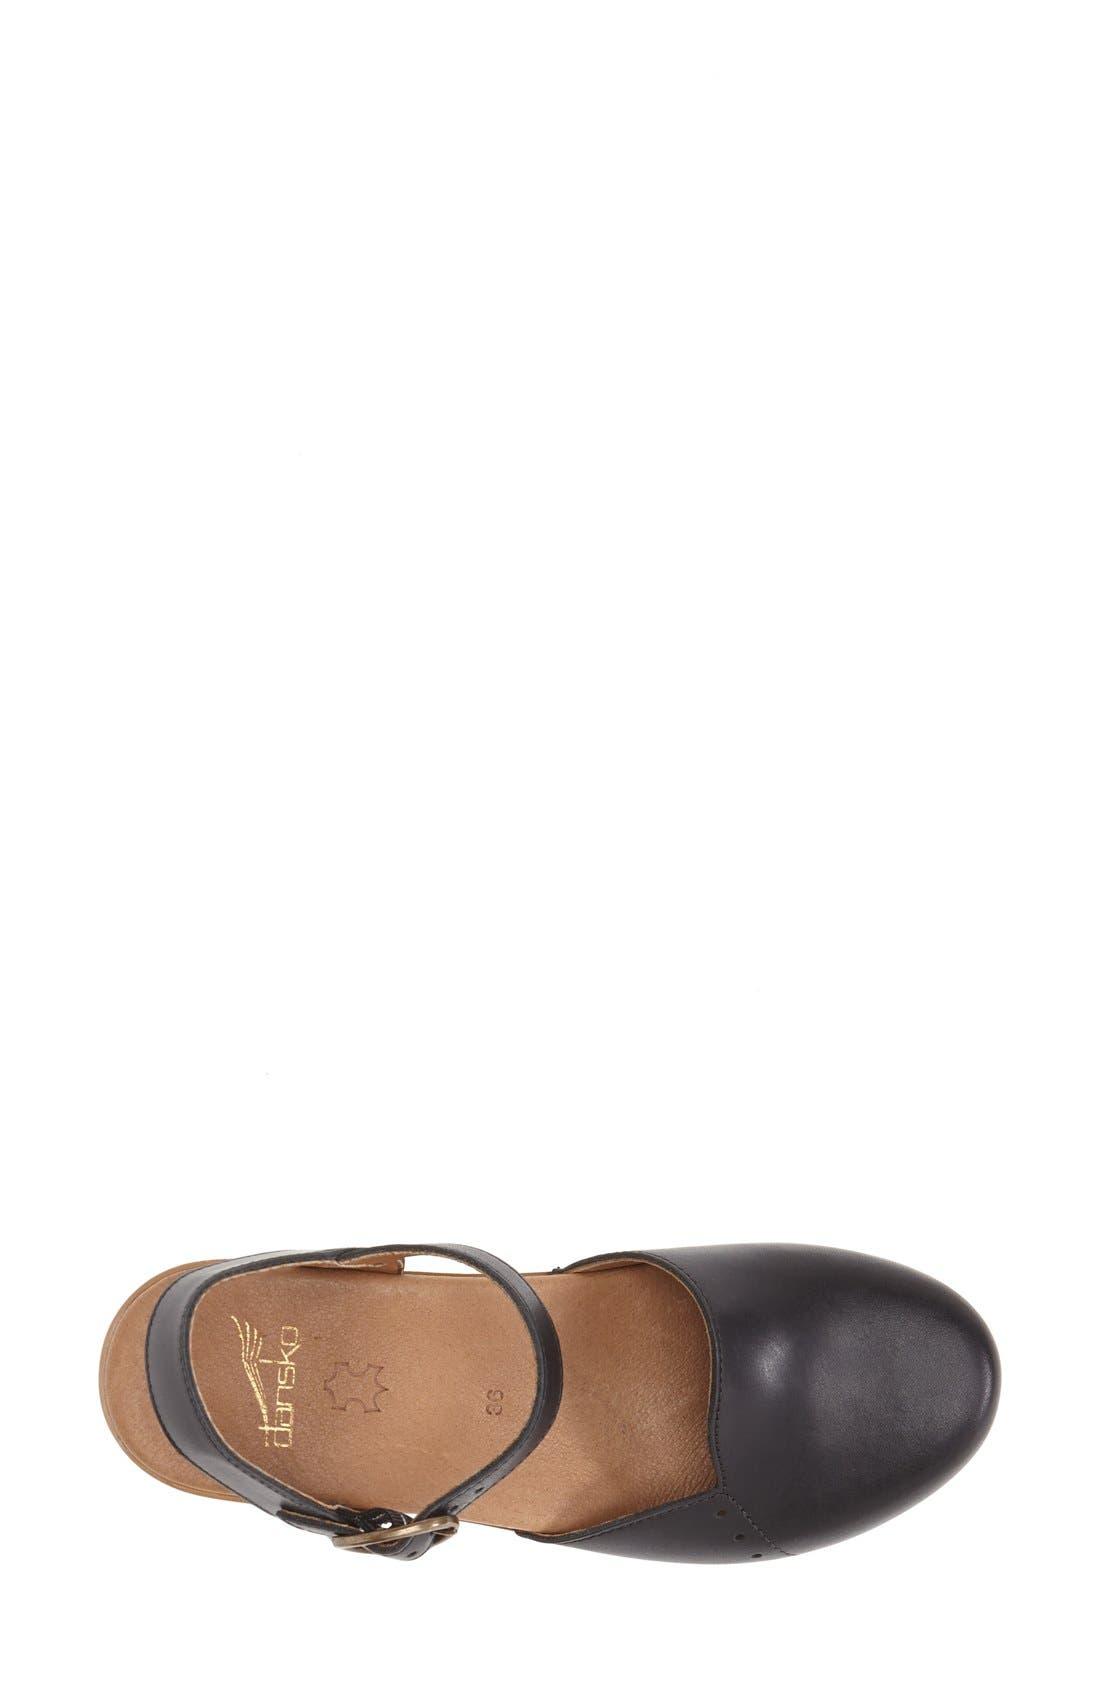 'Maisie' Ankle Strap Leather Pump,                             Alternate thumbnail 4, color,                             001